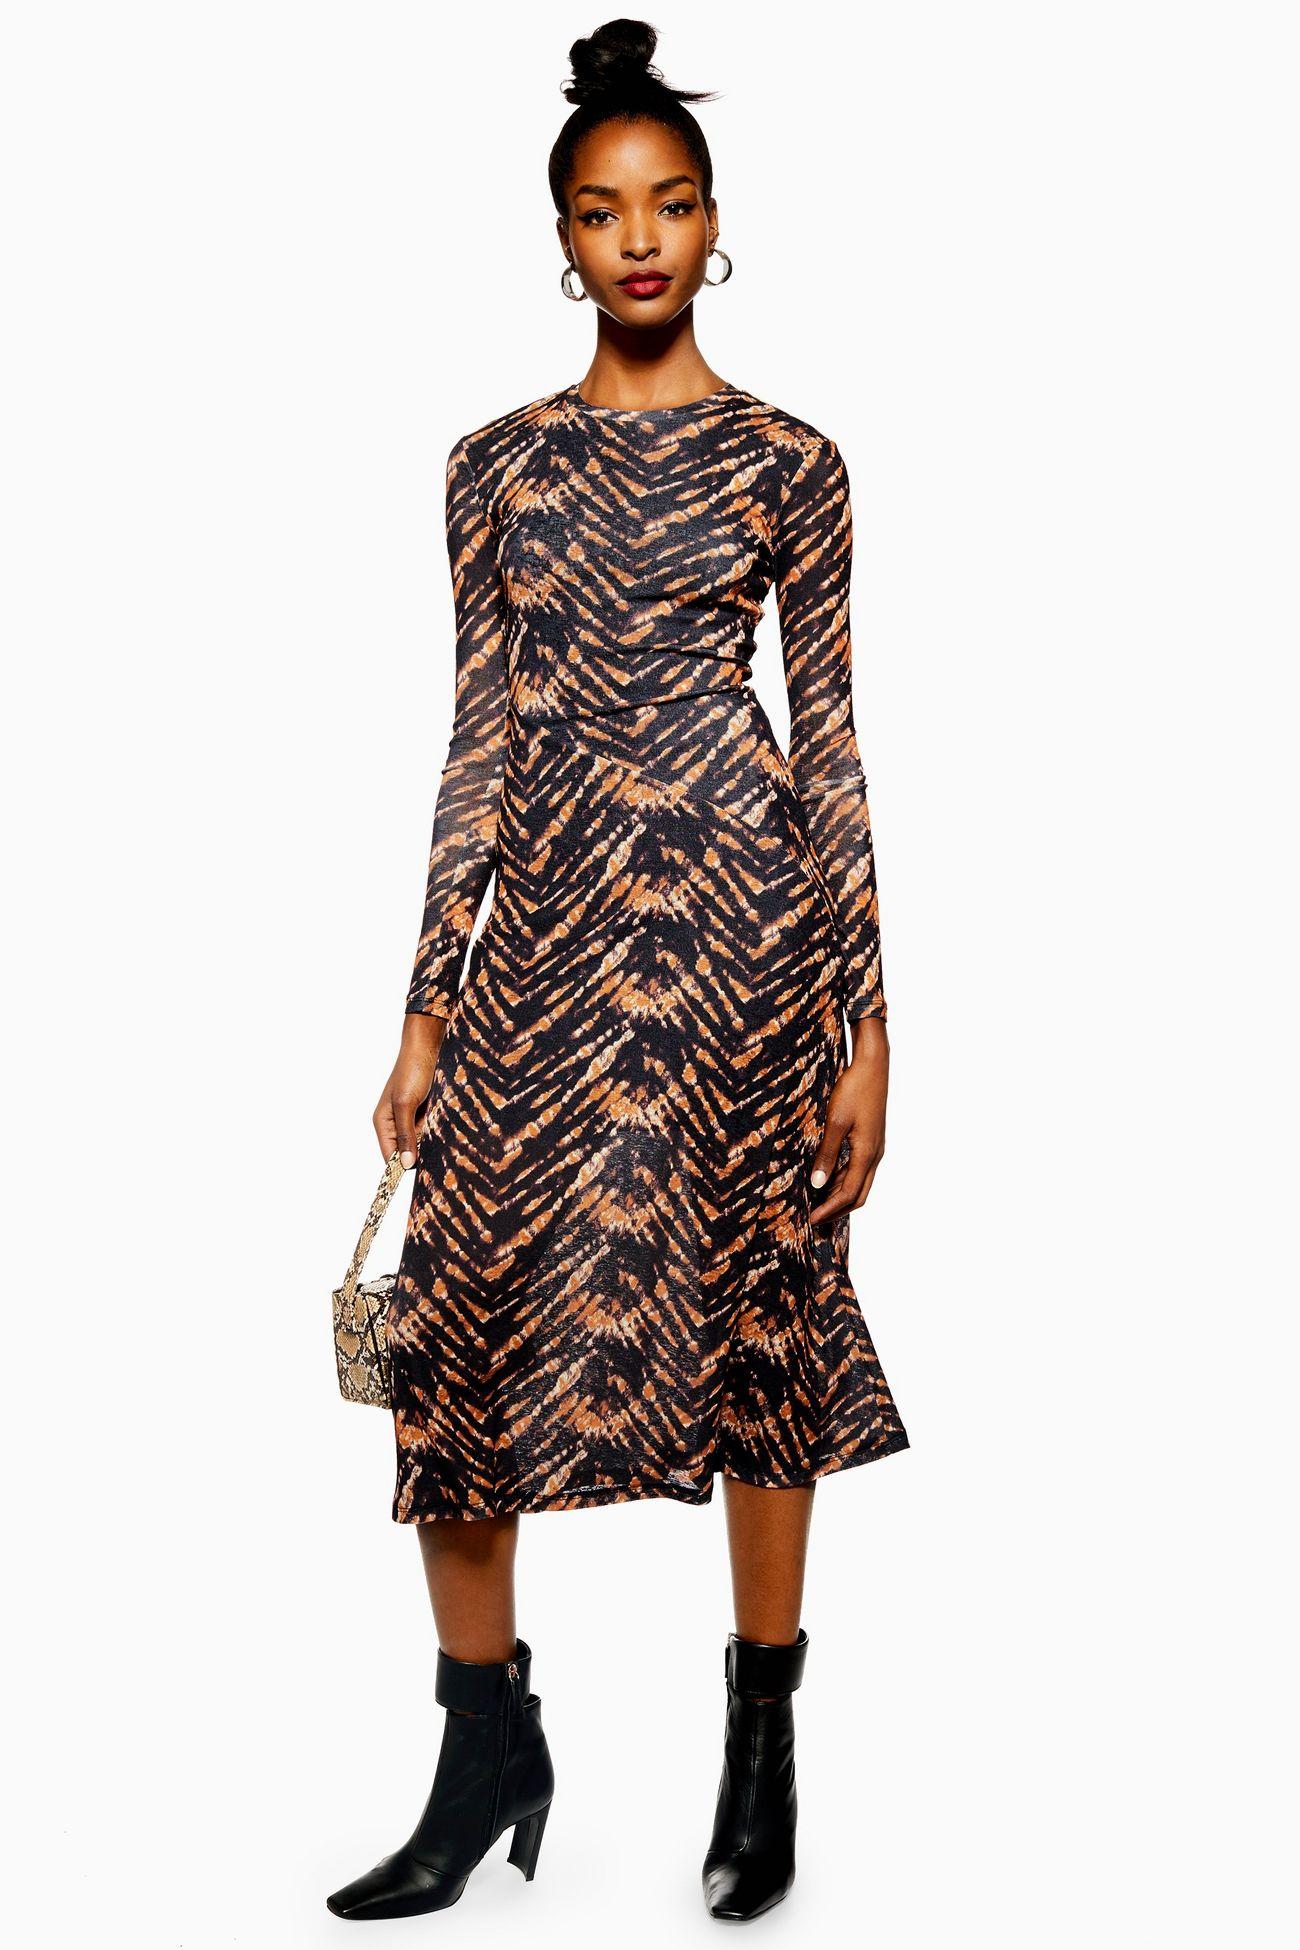 topshop winter midi dress